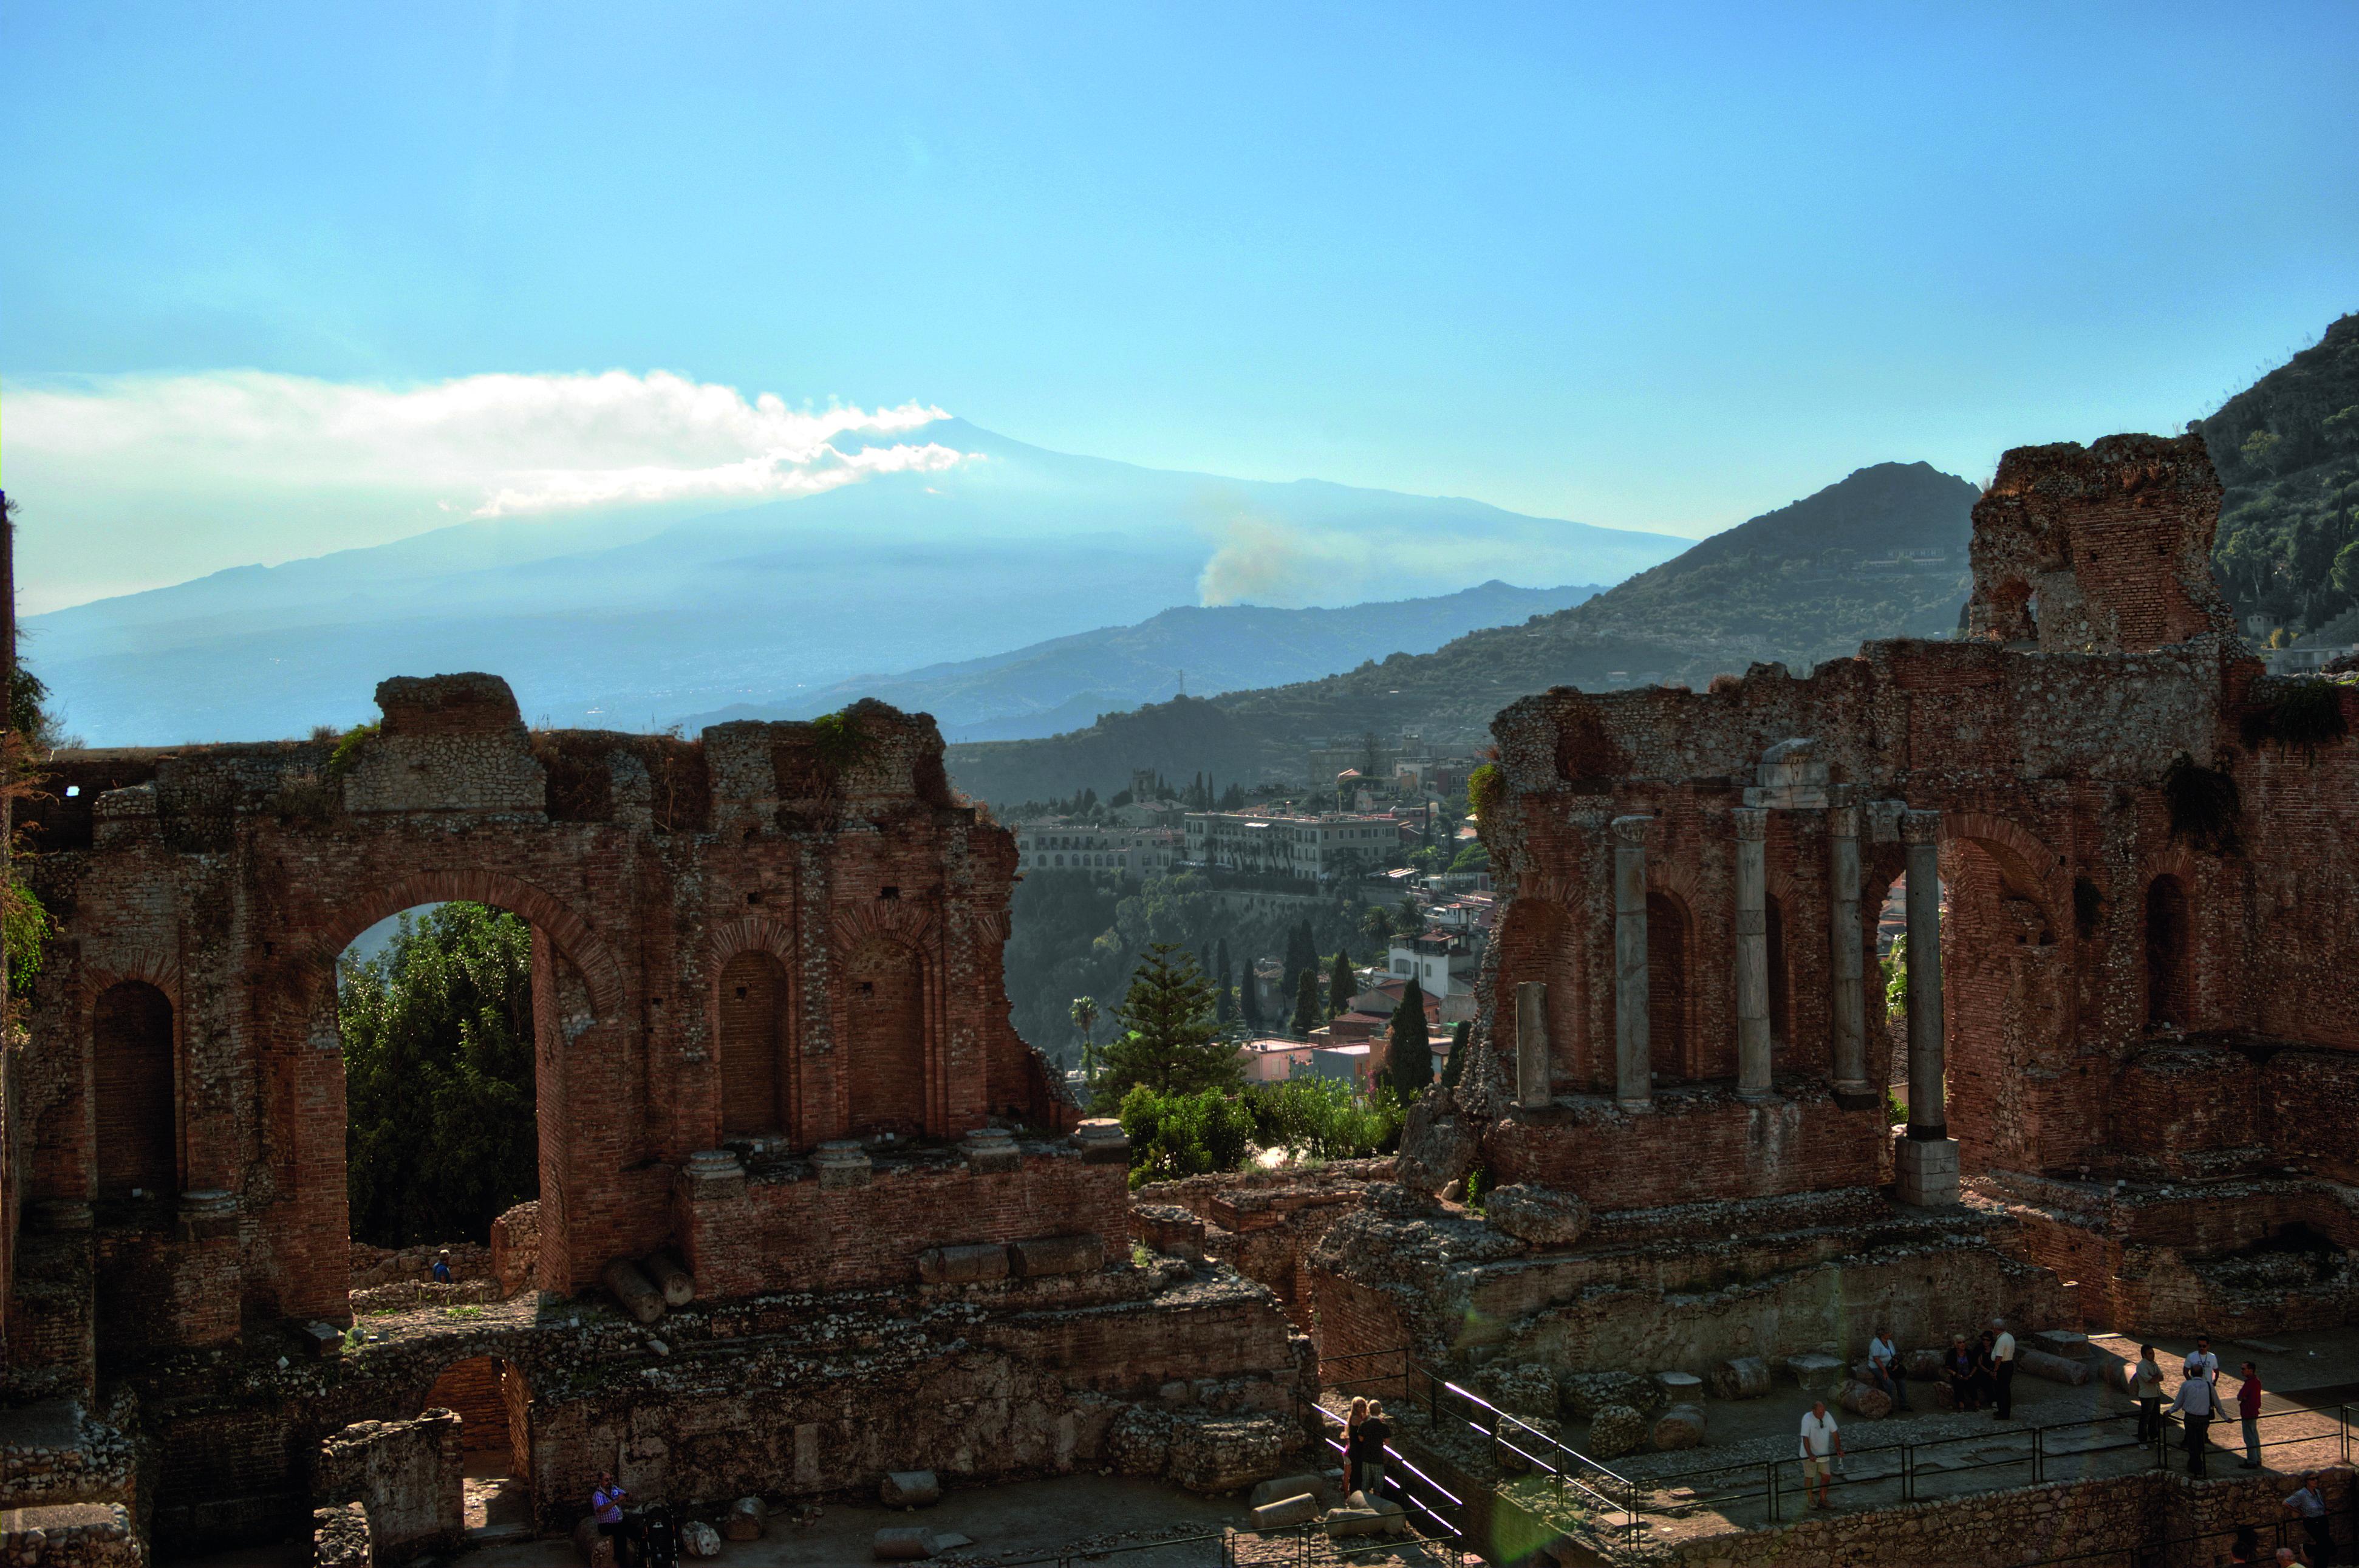 {{de Italien, Sizilien, Taormina, Antikes Theater}} {{en Italy, Sicily, Taormina, ancient theatre}}